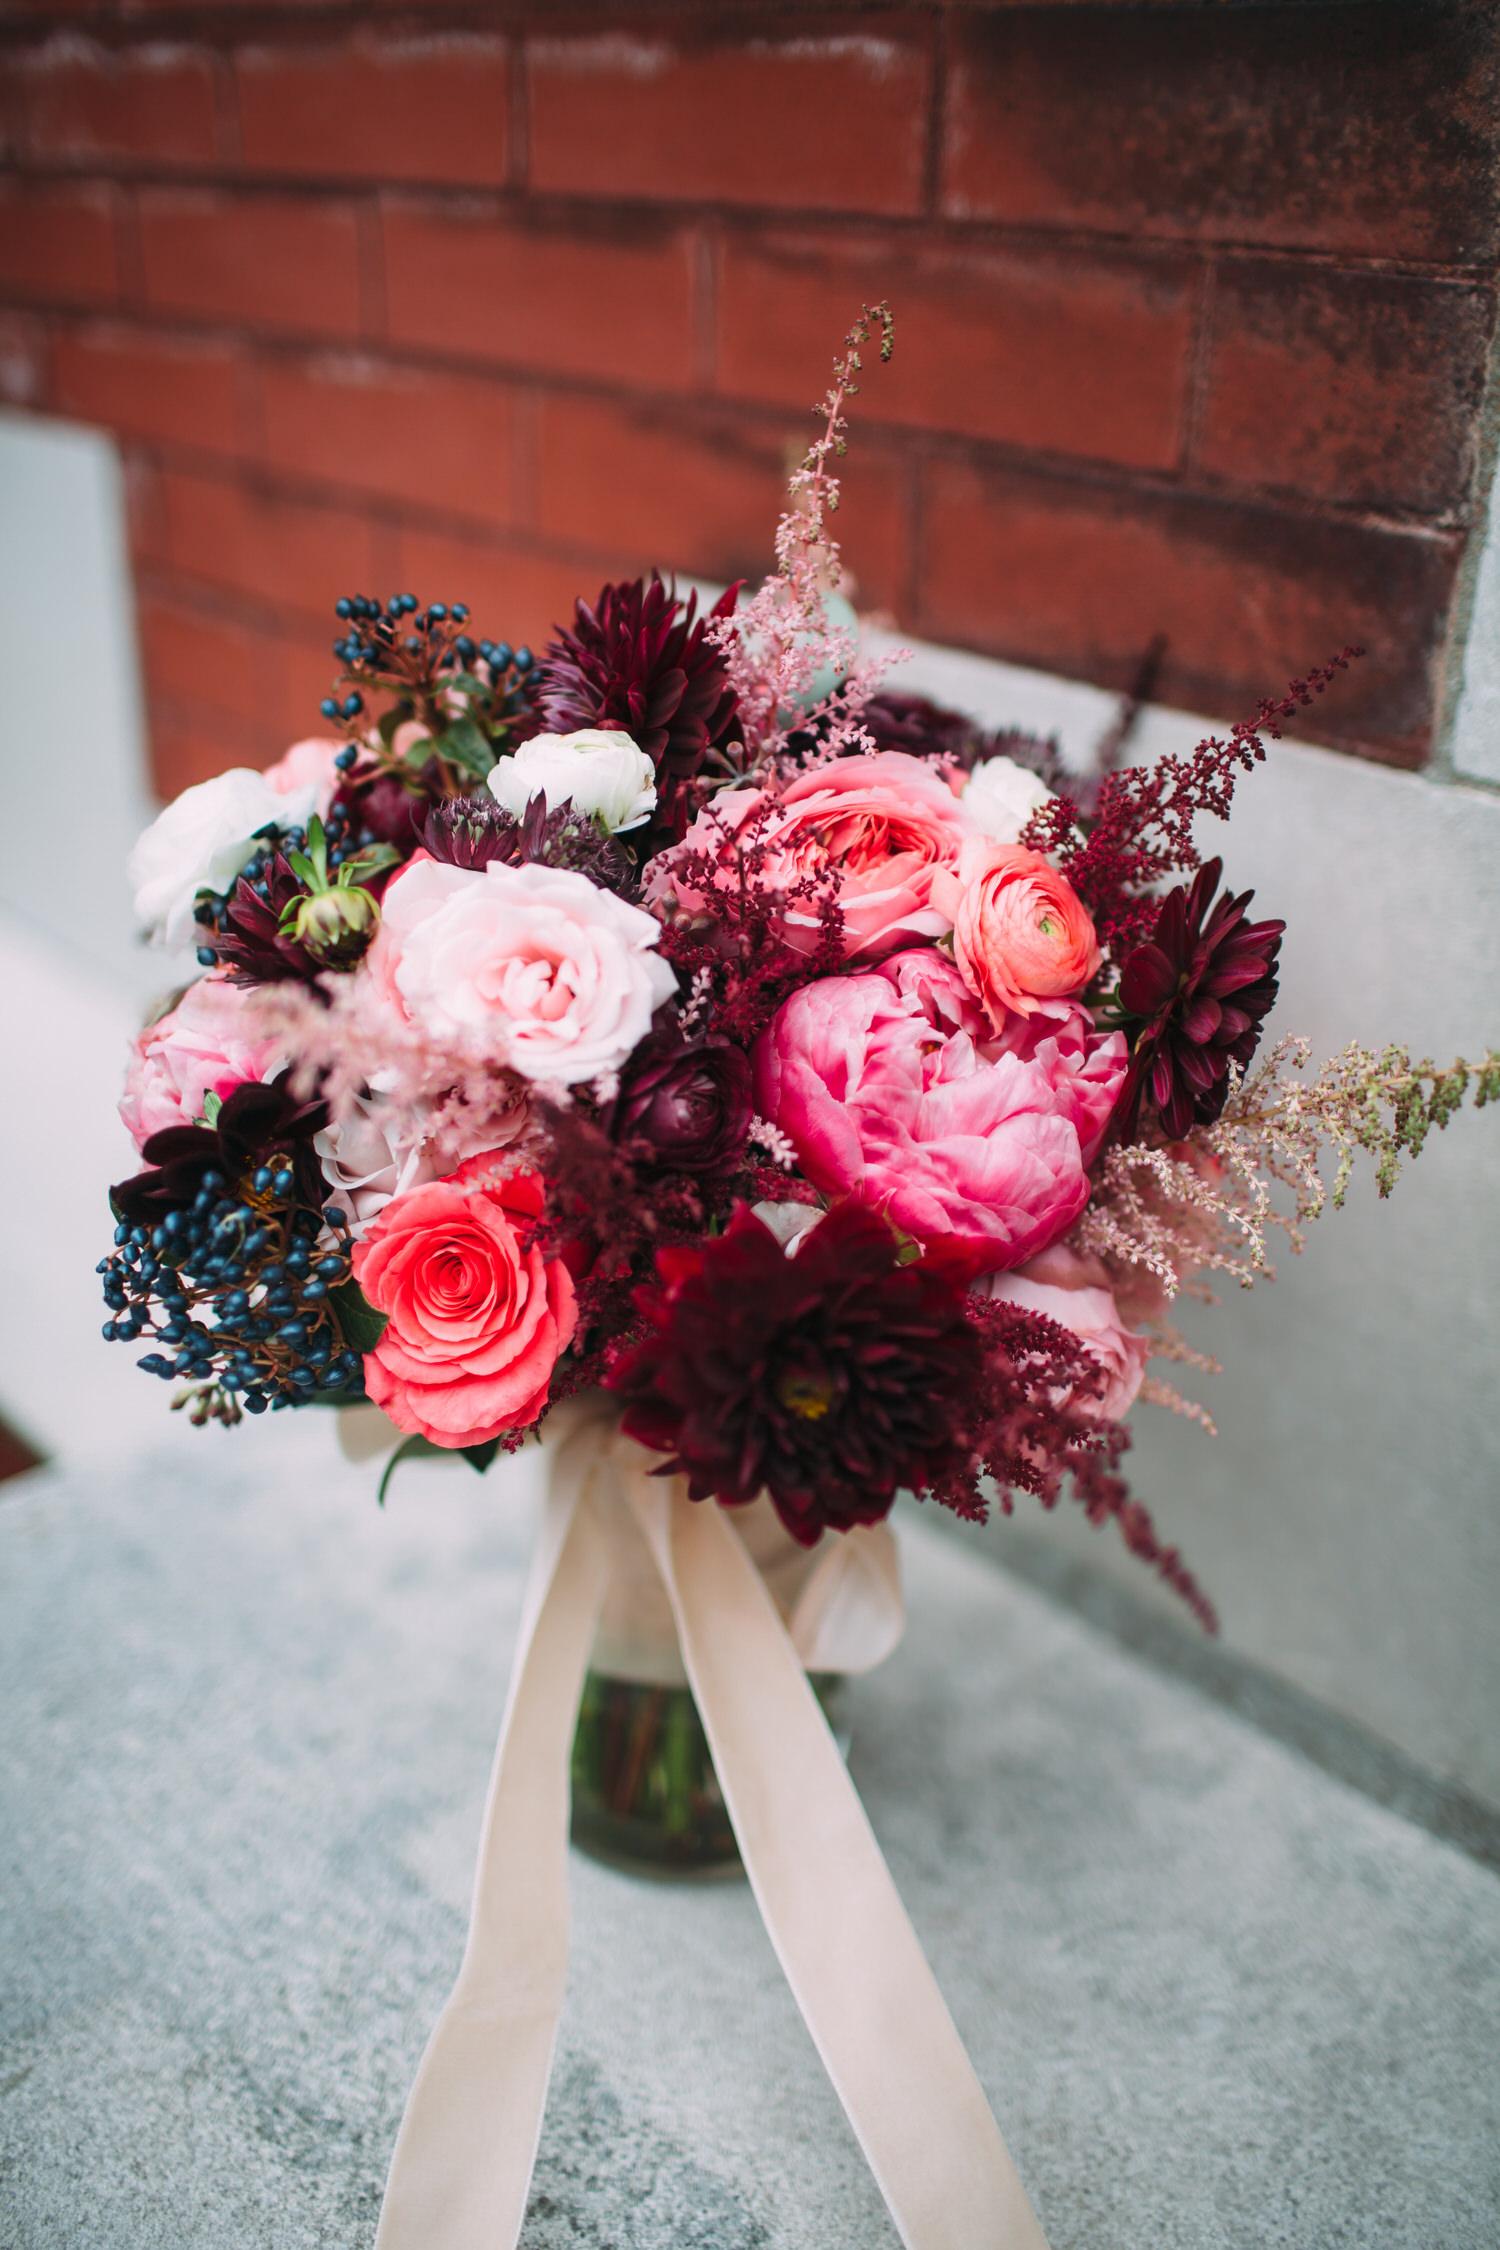 Tina Barerra: The Special Event Florist - FLORIST